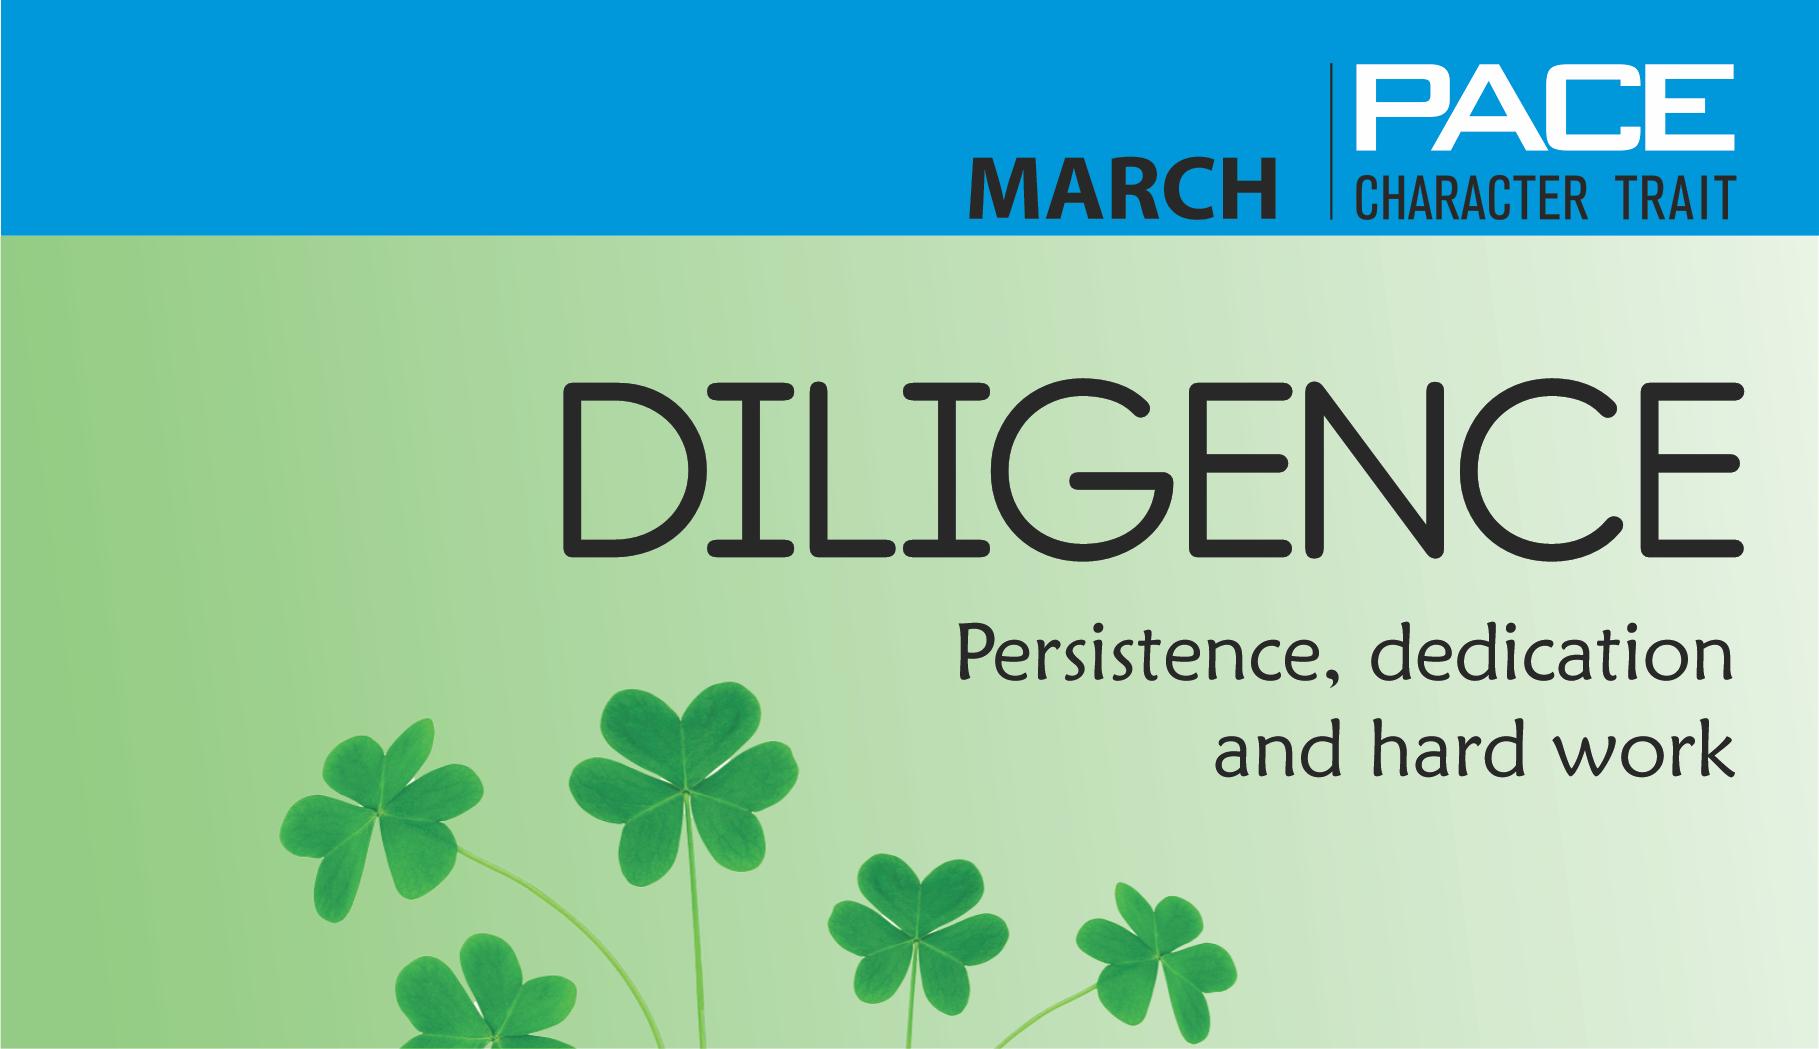 PACE March Trait Diligence